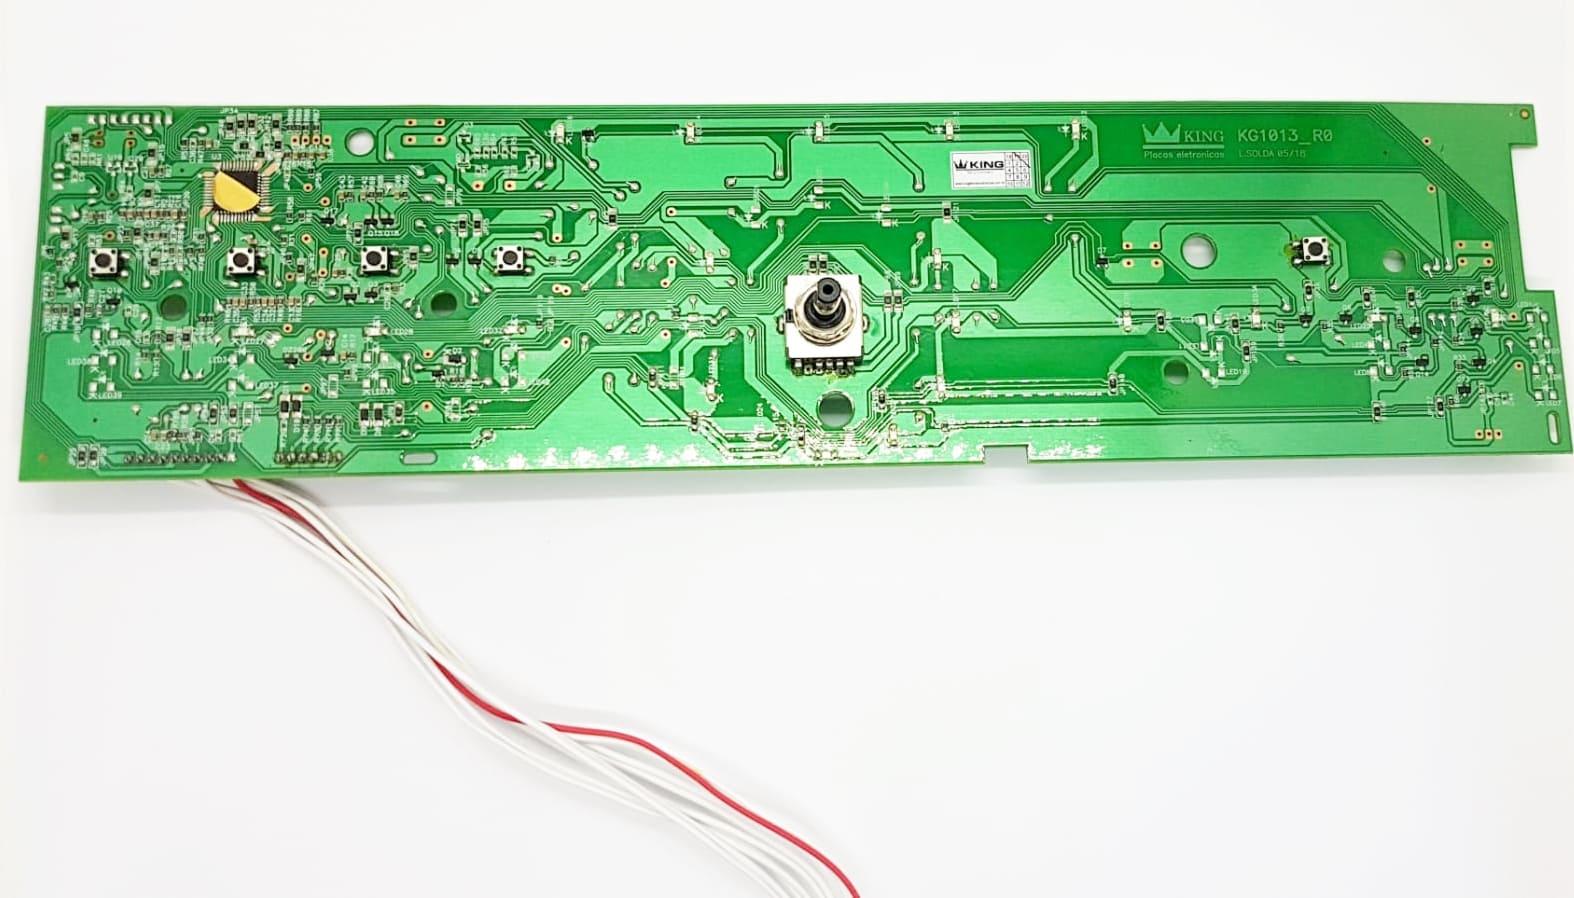 Placa Interface Compatível Lavadora Bwl11 W10301604 Versão 2